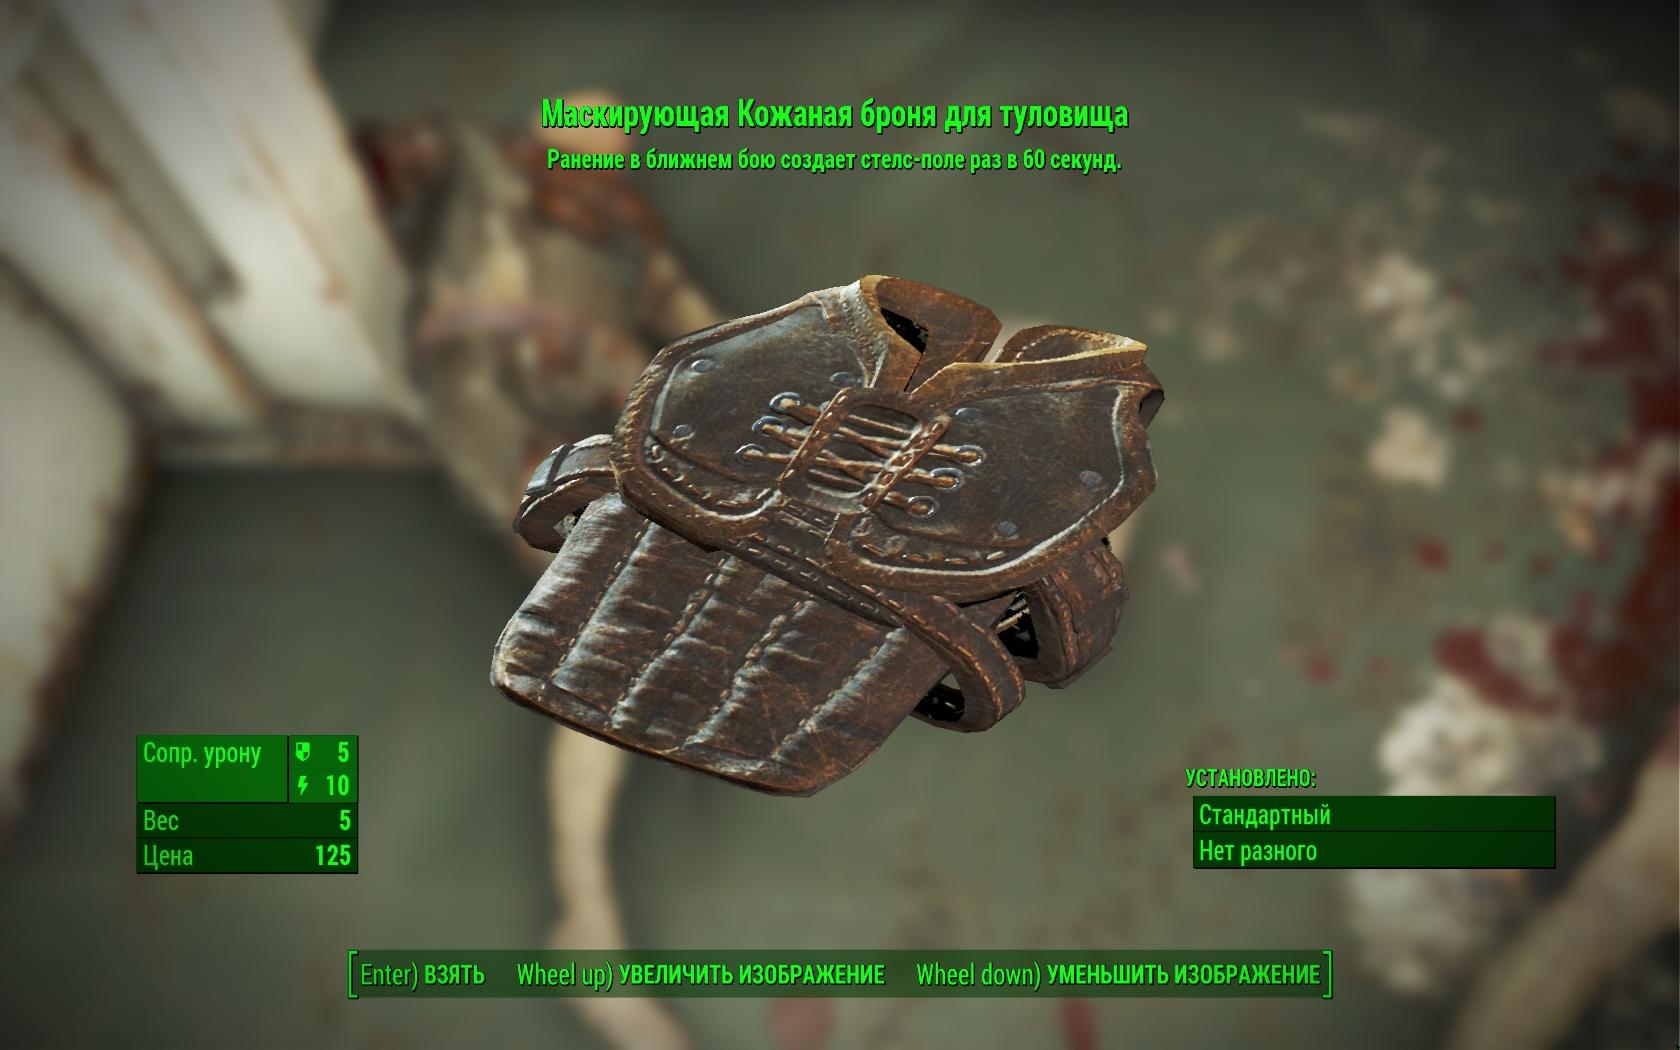 Маскирующая кожаная броня для туловища - Fallout 4 броня, кожаная, Маскирующая, Одежда